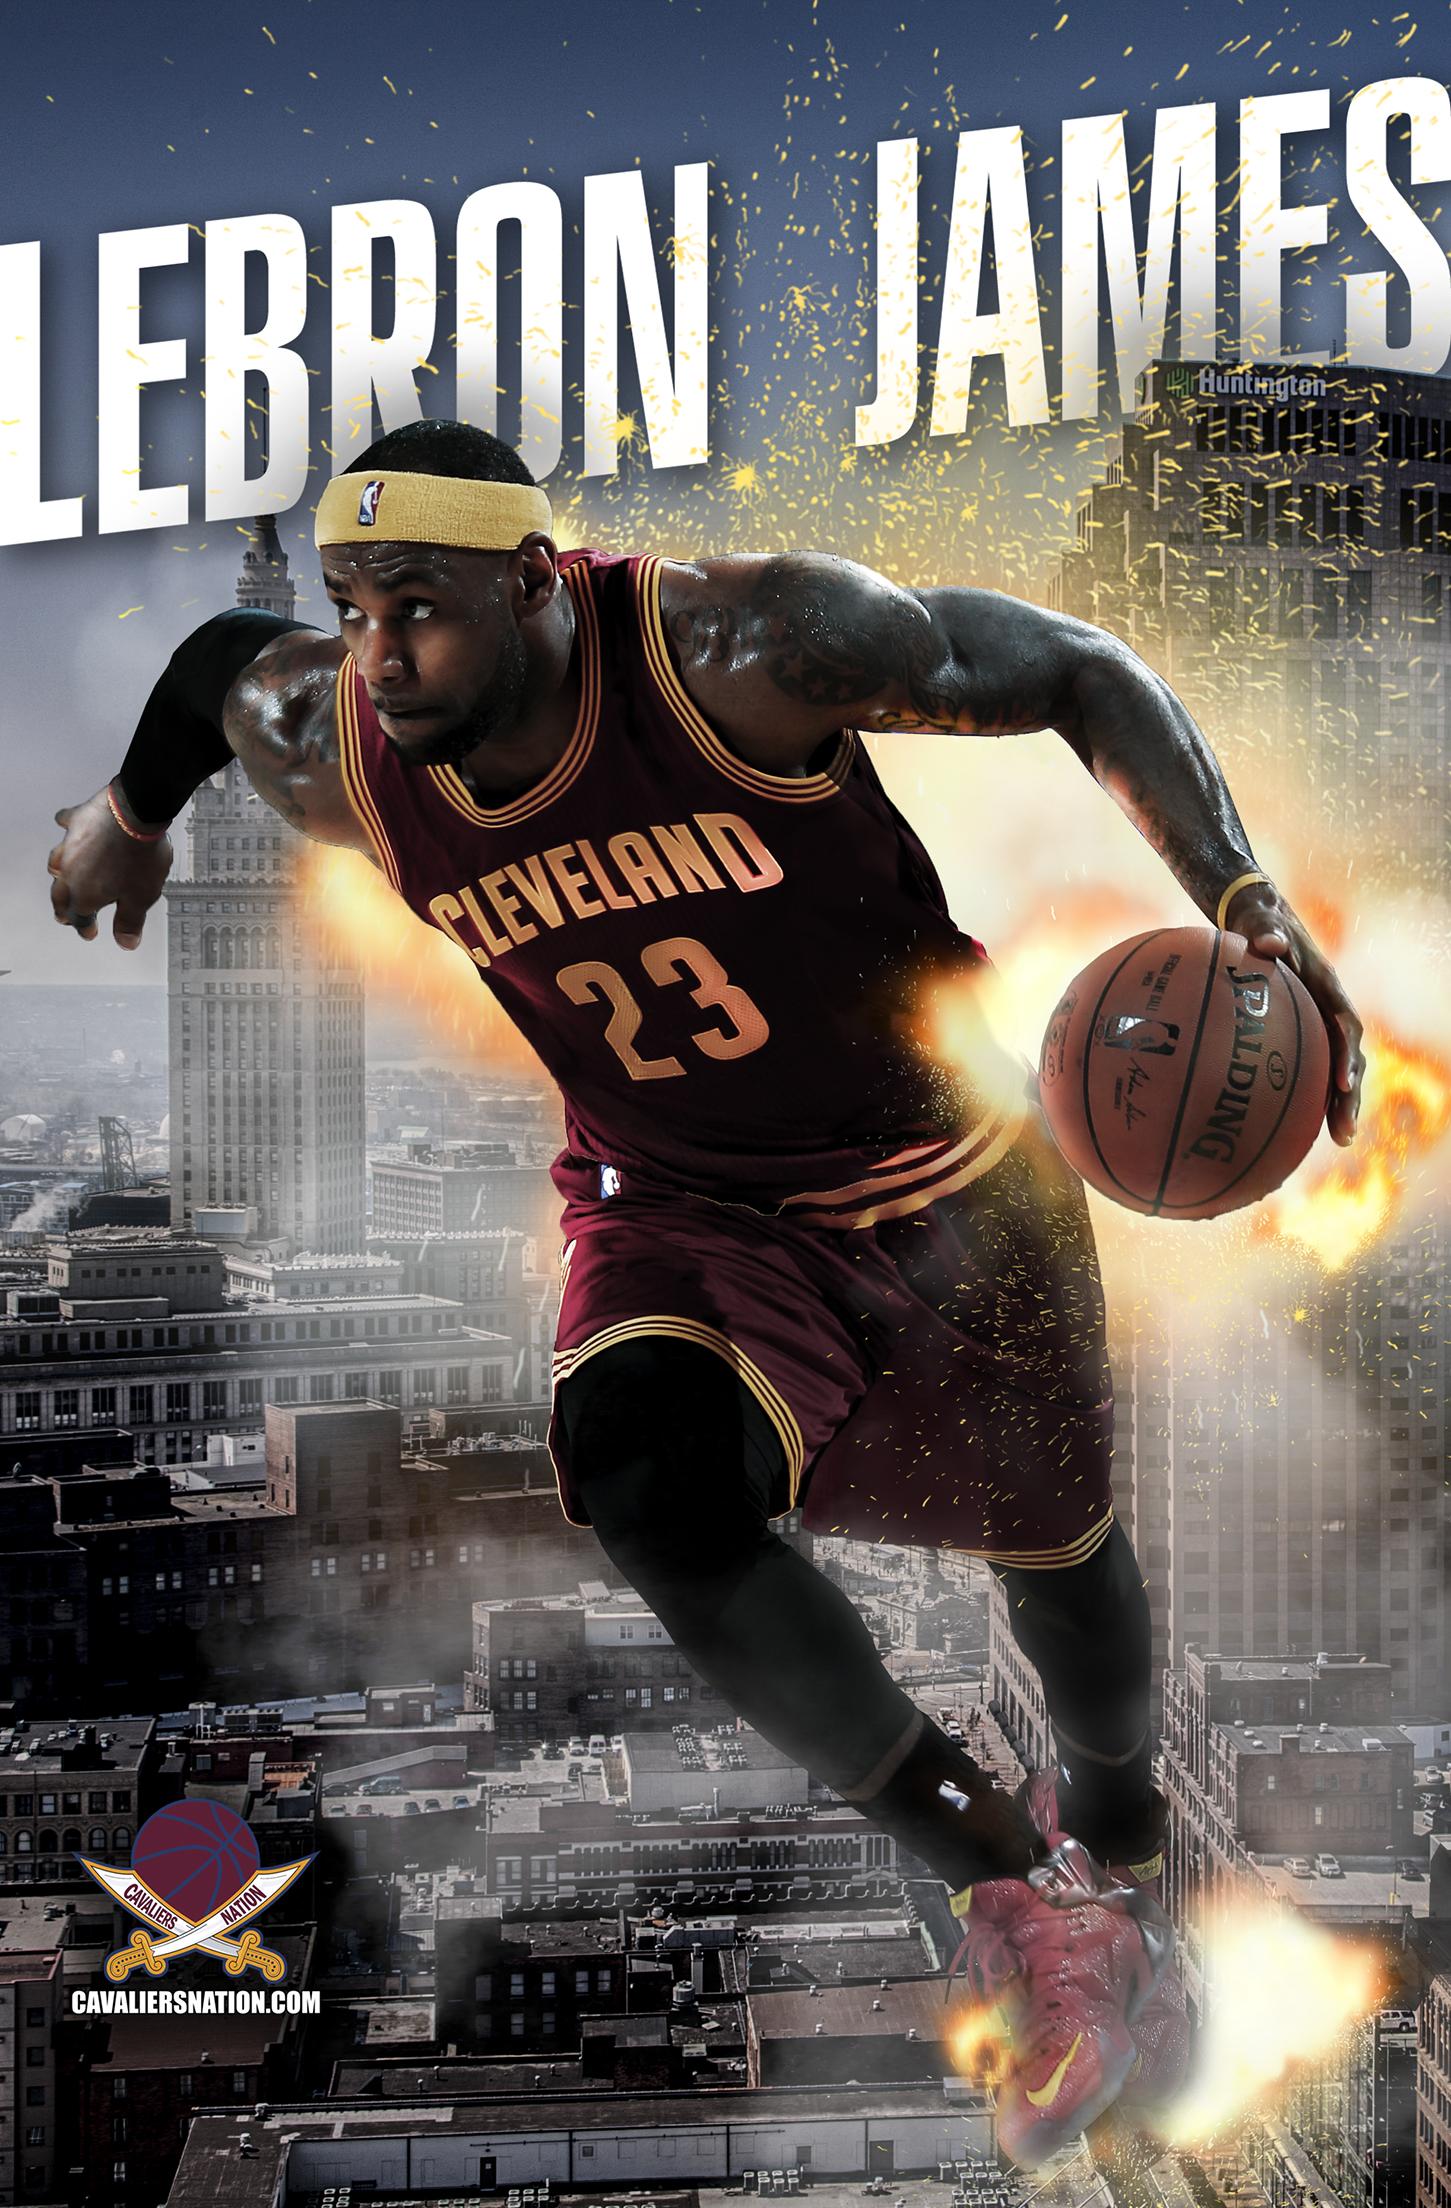 NBA LeBron James IphoneIpod Wallpaper 1451x2208